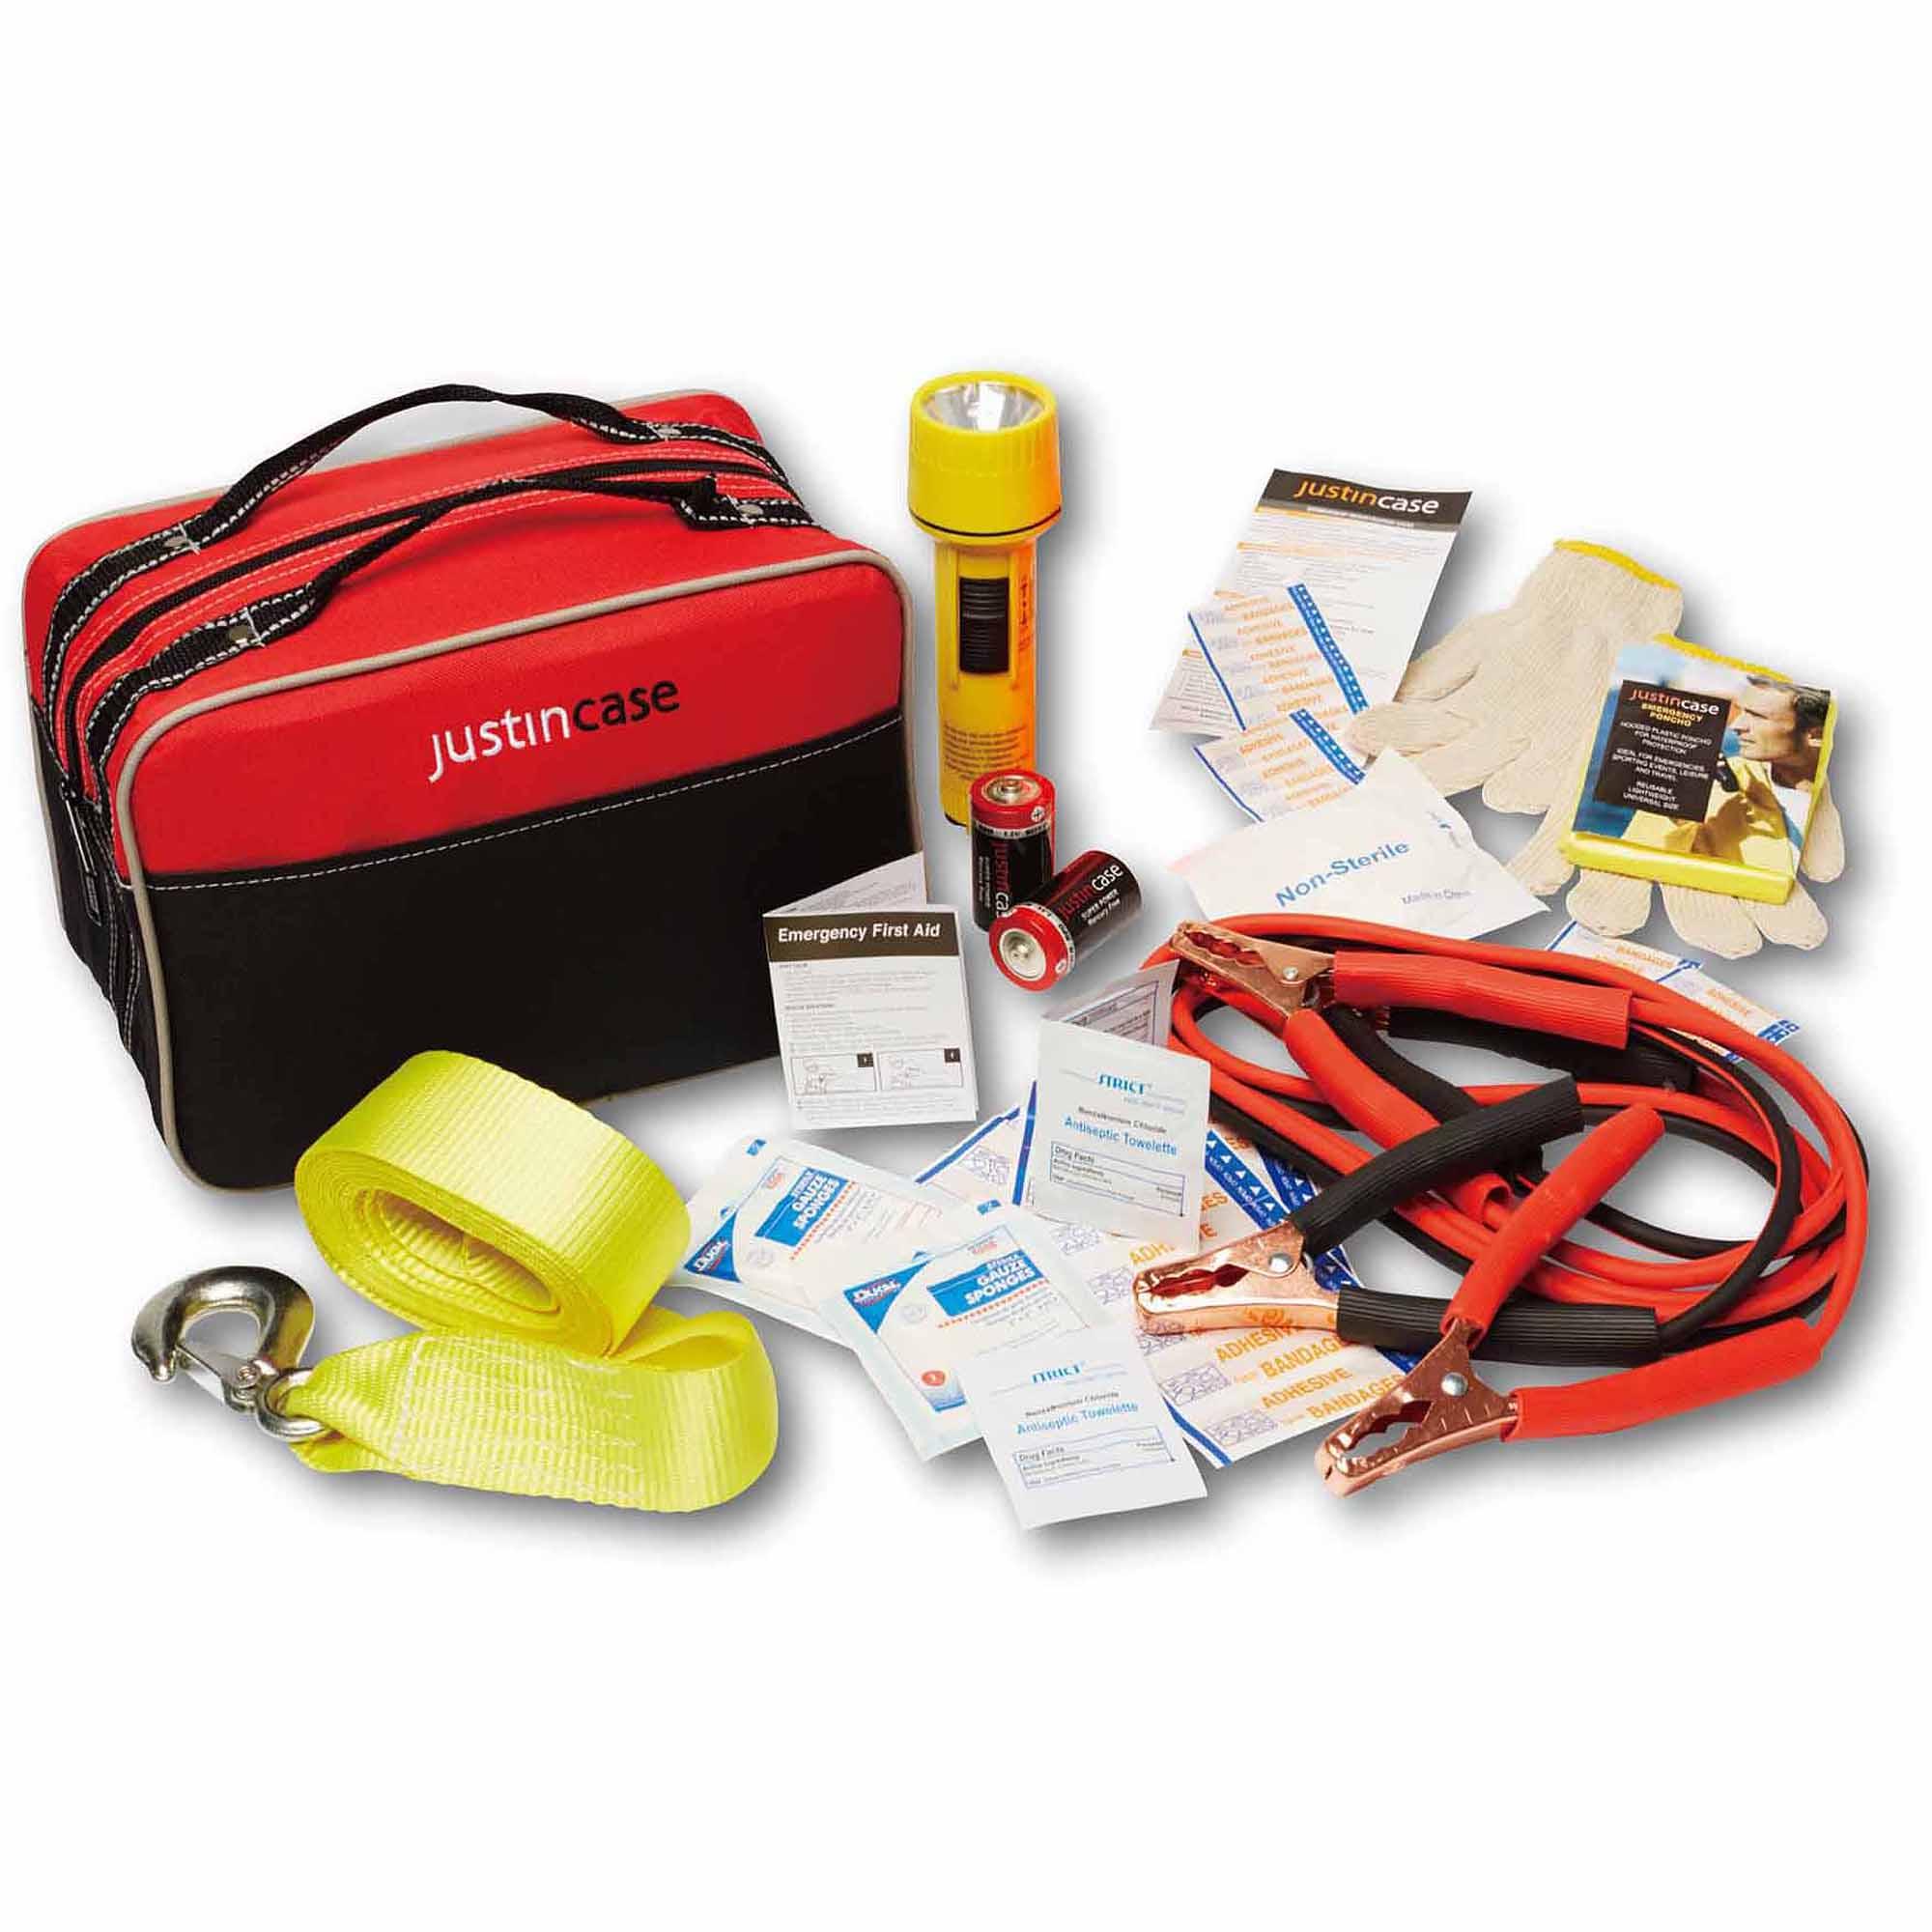 Justin Case Travel Pro Auto Safety Kit $10.65